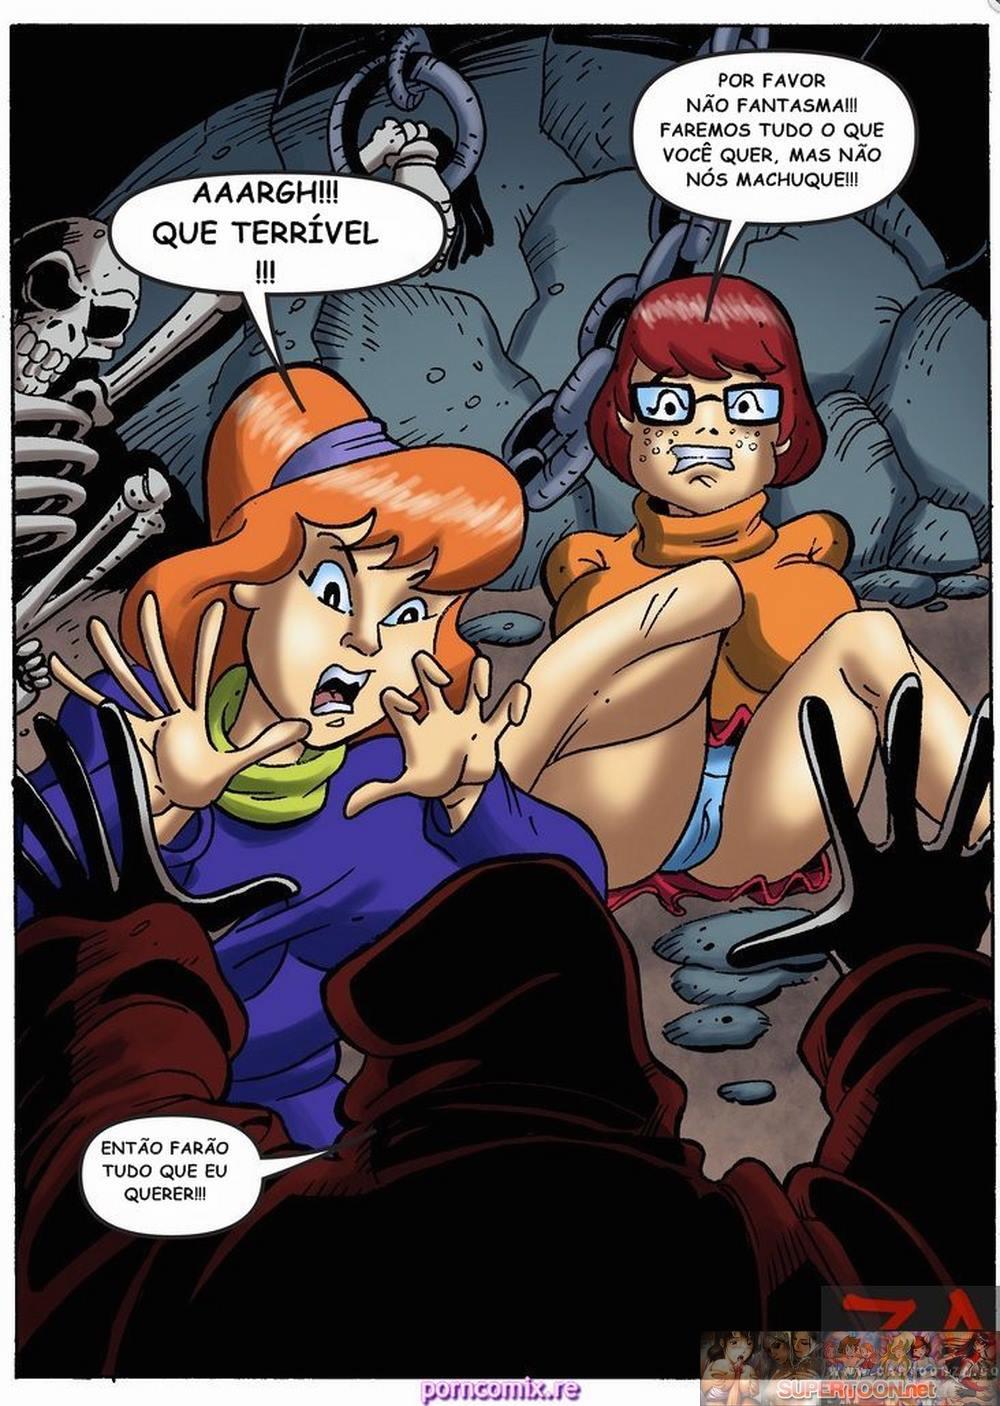 Hentaihome.net-Scooby-Doo-sexo-1